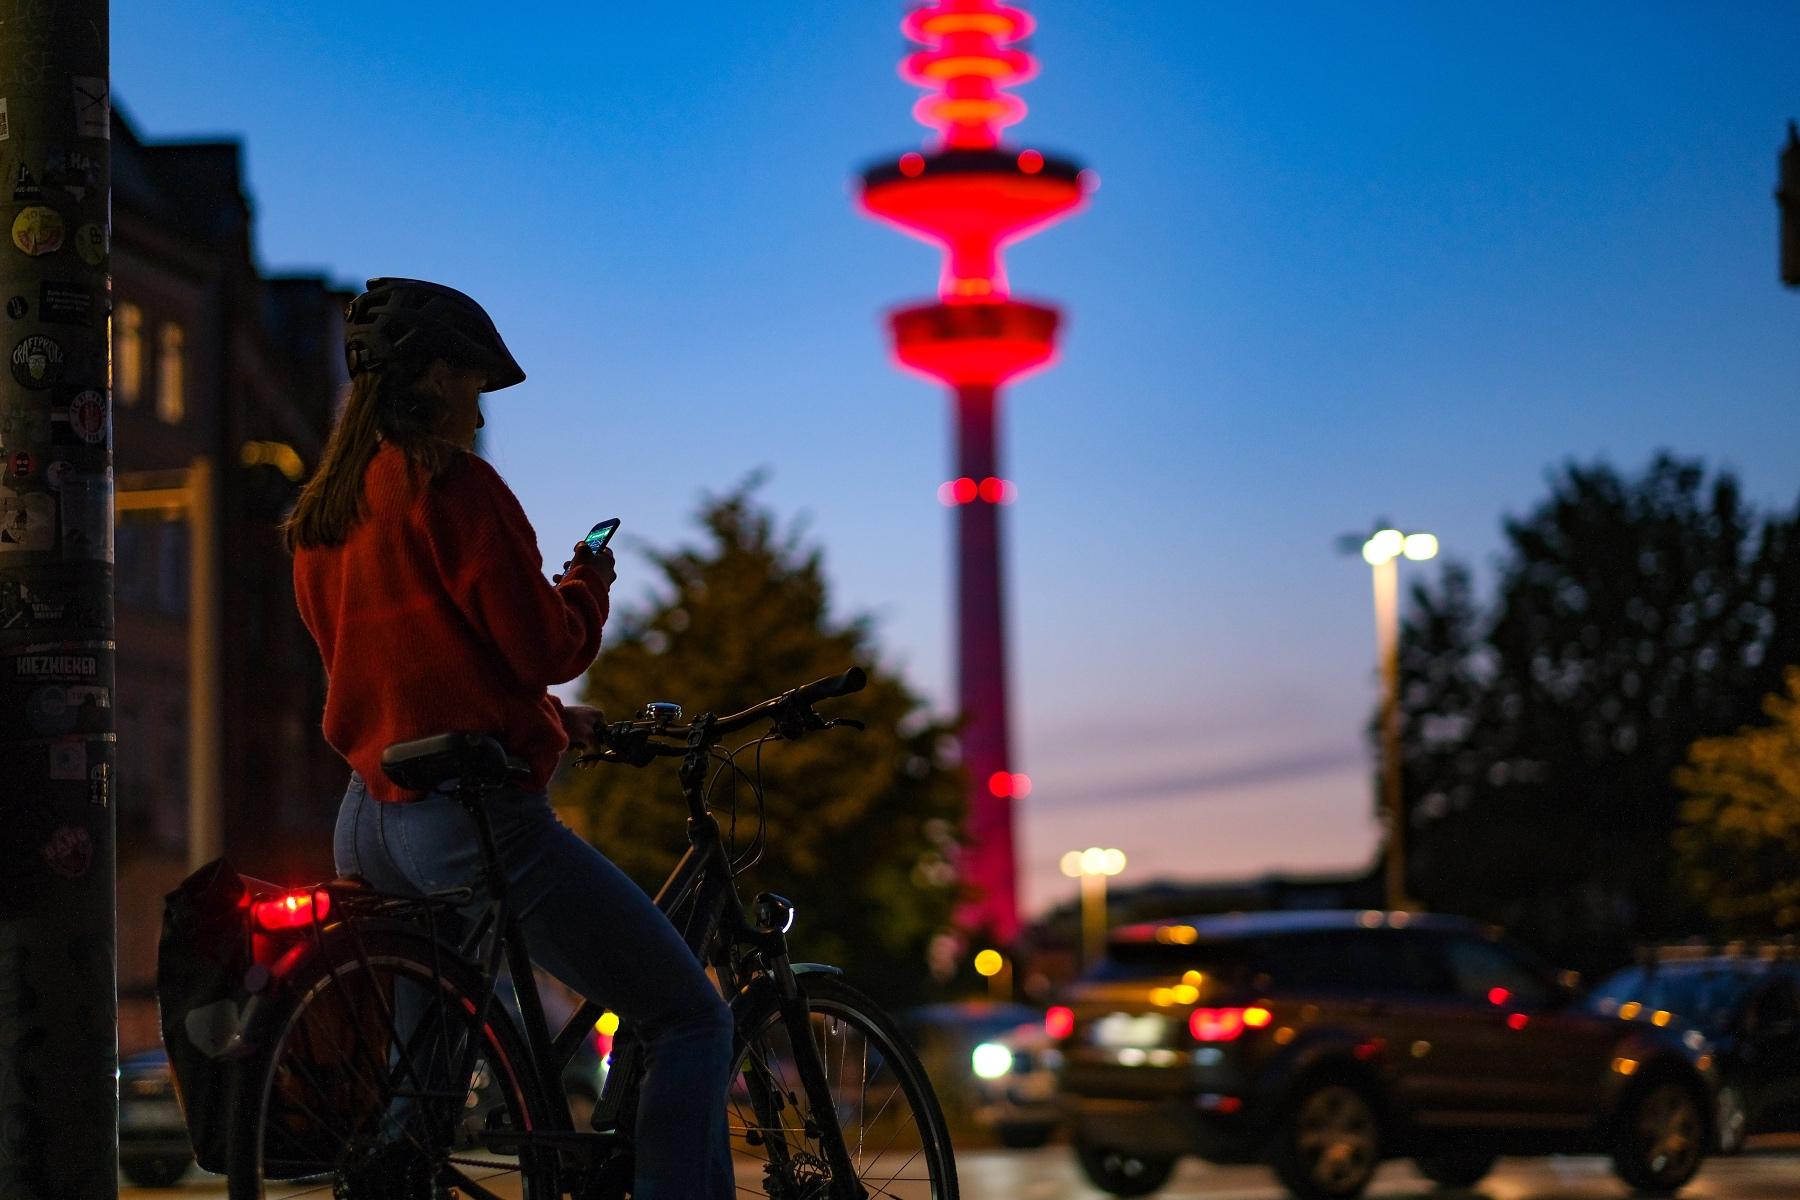 Geheimtipp Hamburg Its Weltkongress Hamburg Bike Unsplash 09 – ©Unsplash